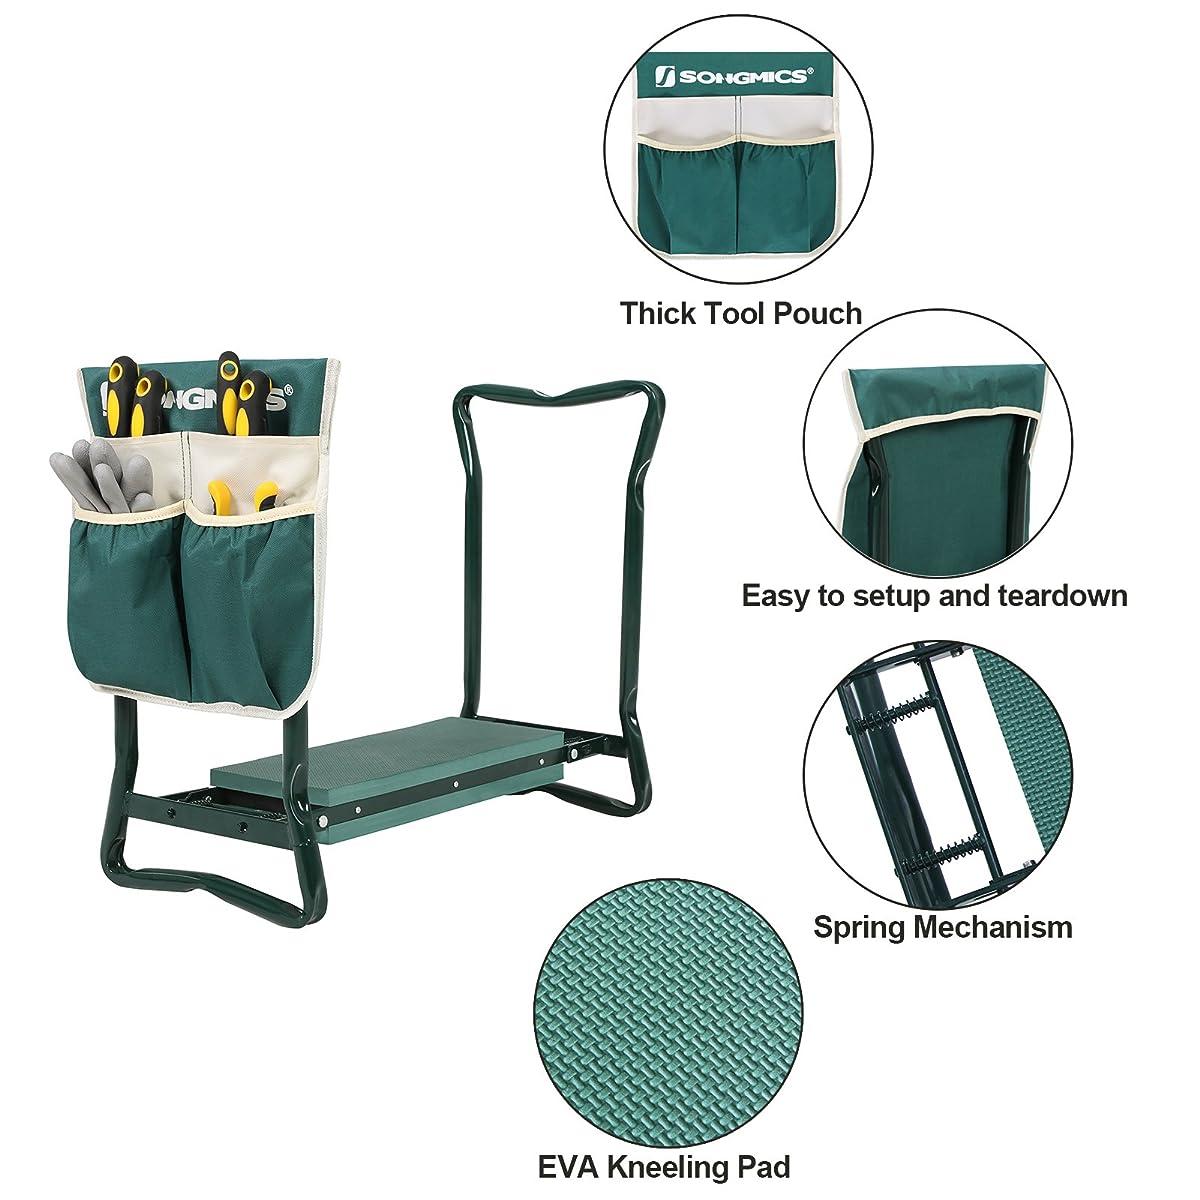 SONGMICS Garden Kneeler Seat with Bonus Upgraded Tool Pouch and EVA Kneeling Pad Foldable Stool UGGK49L